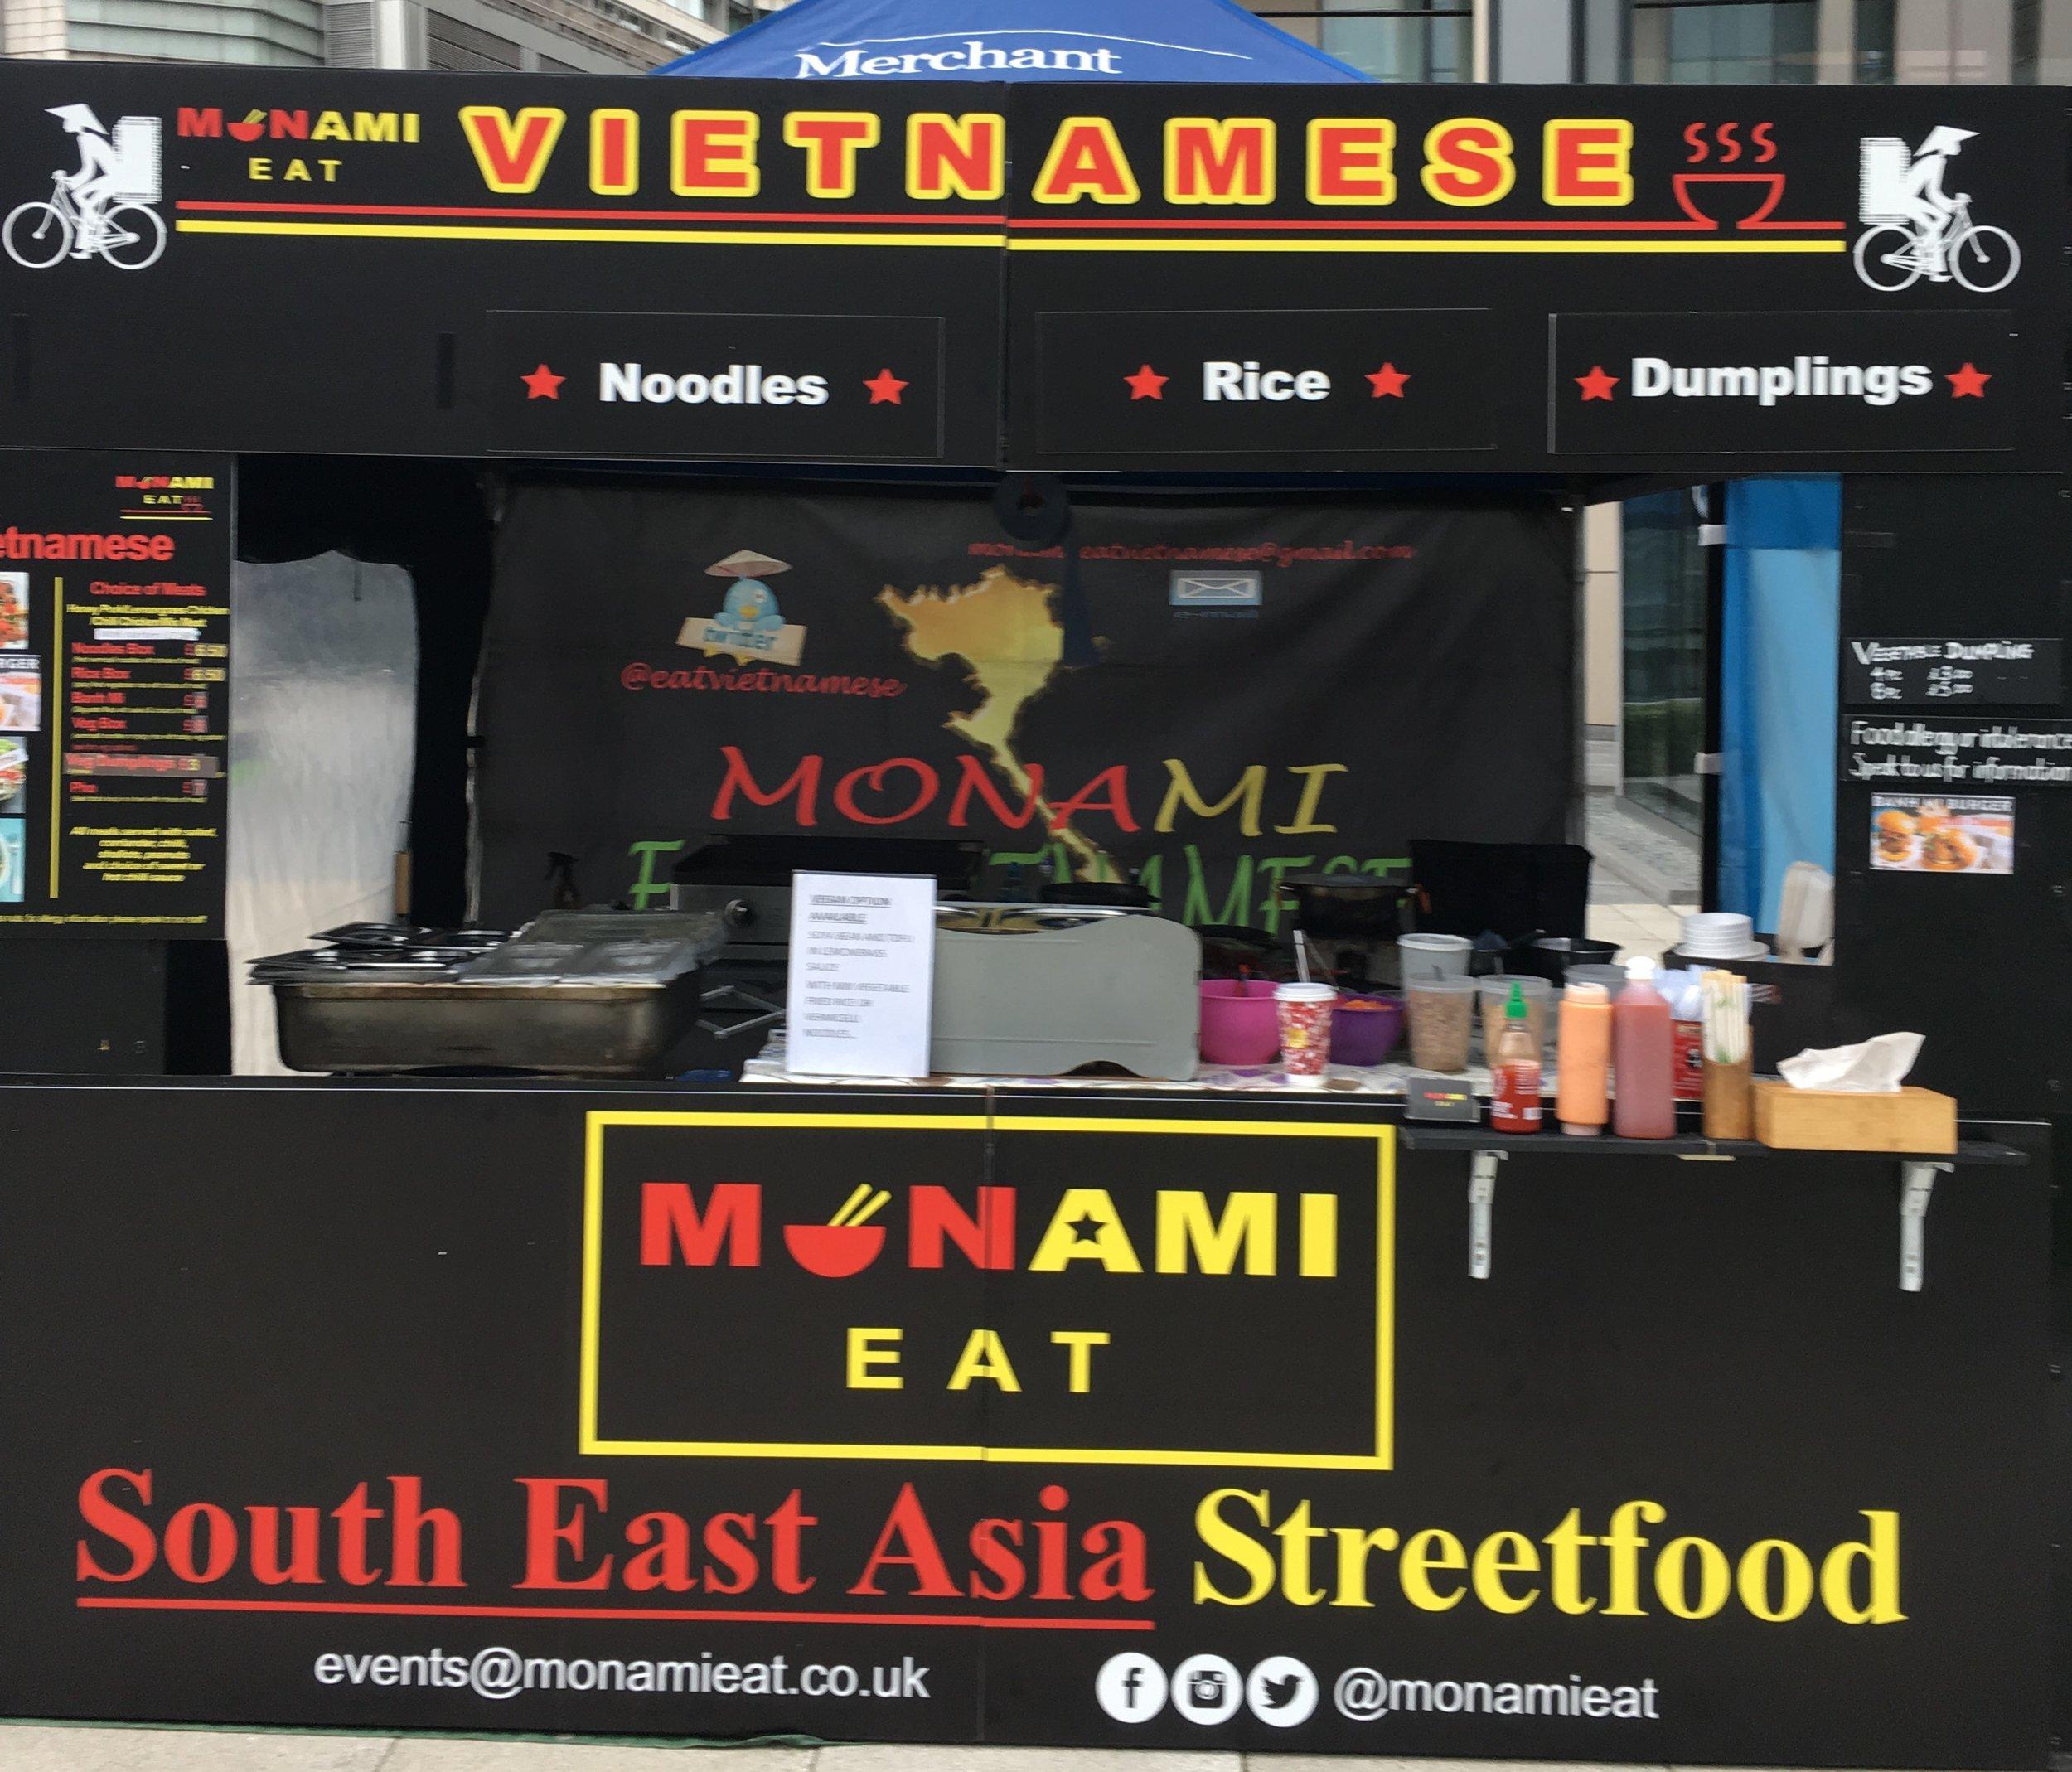 MONAMI EAT   Authentic Vietnamese streetfood like noodles with honey pork, chilli chicken, dumpling using high quality ingredients    https://twitter.com/eatvietnamese